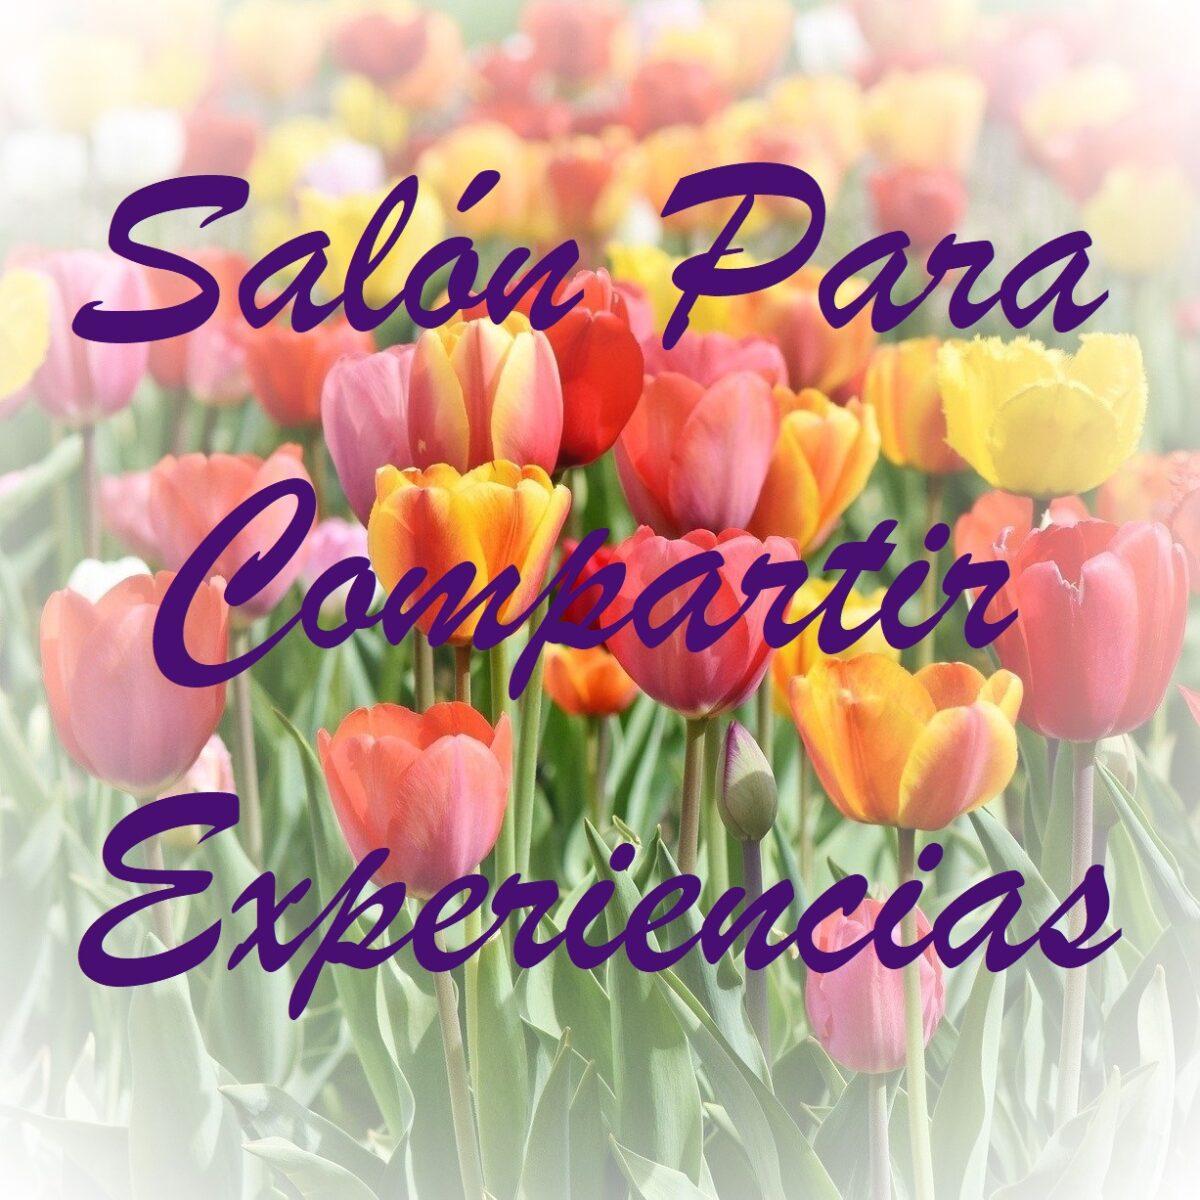 Salón Para Compartir Experiencias (Experiencer Sharing Lounge – Spanish Session)